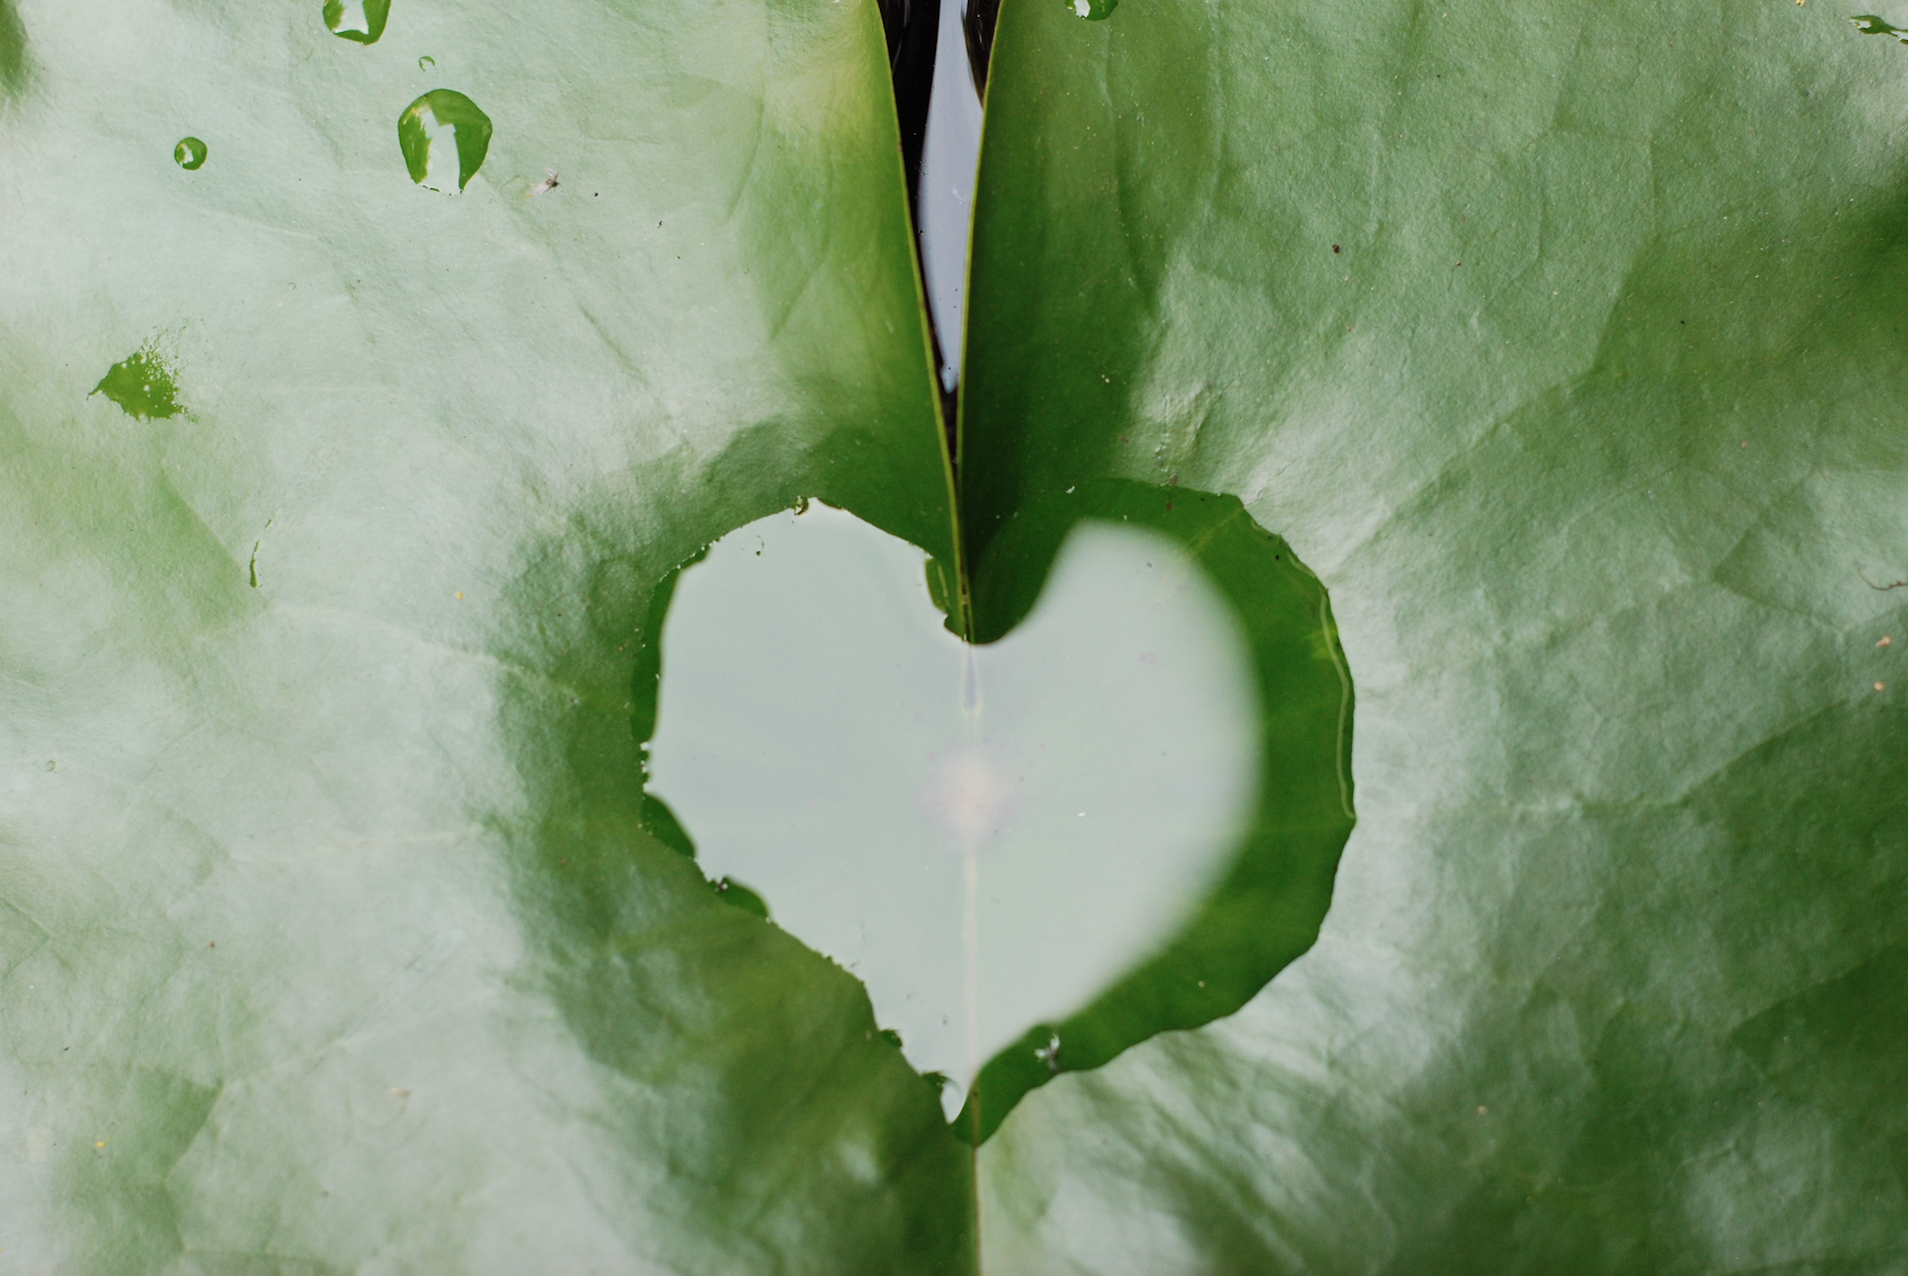 lotus leaf heart ayodhaya.jpg